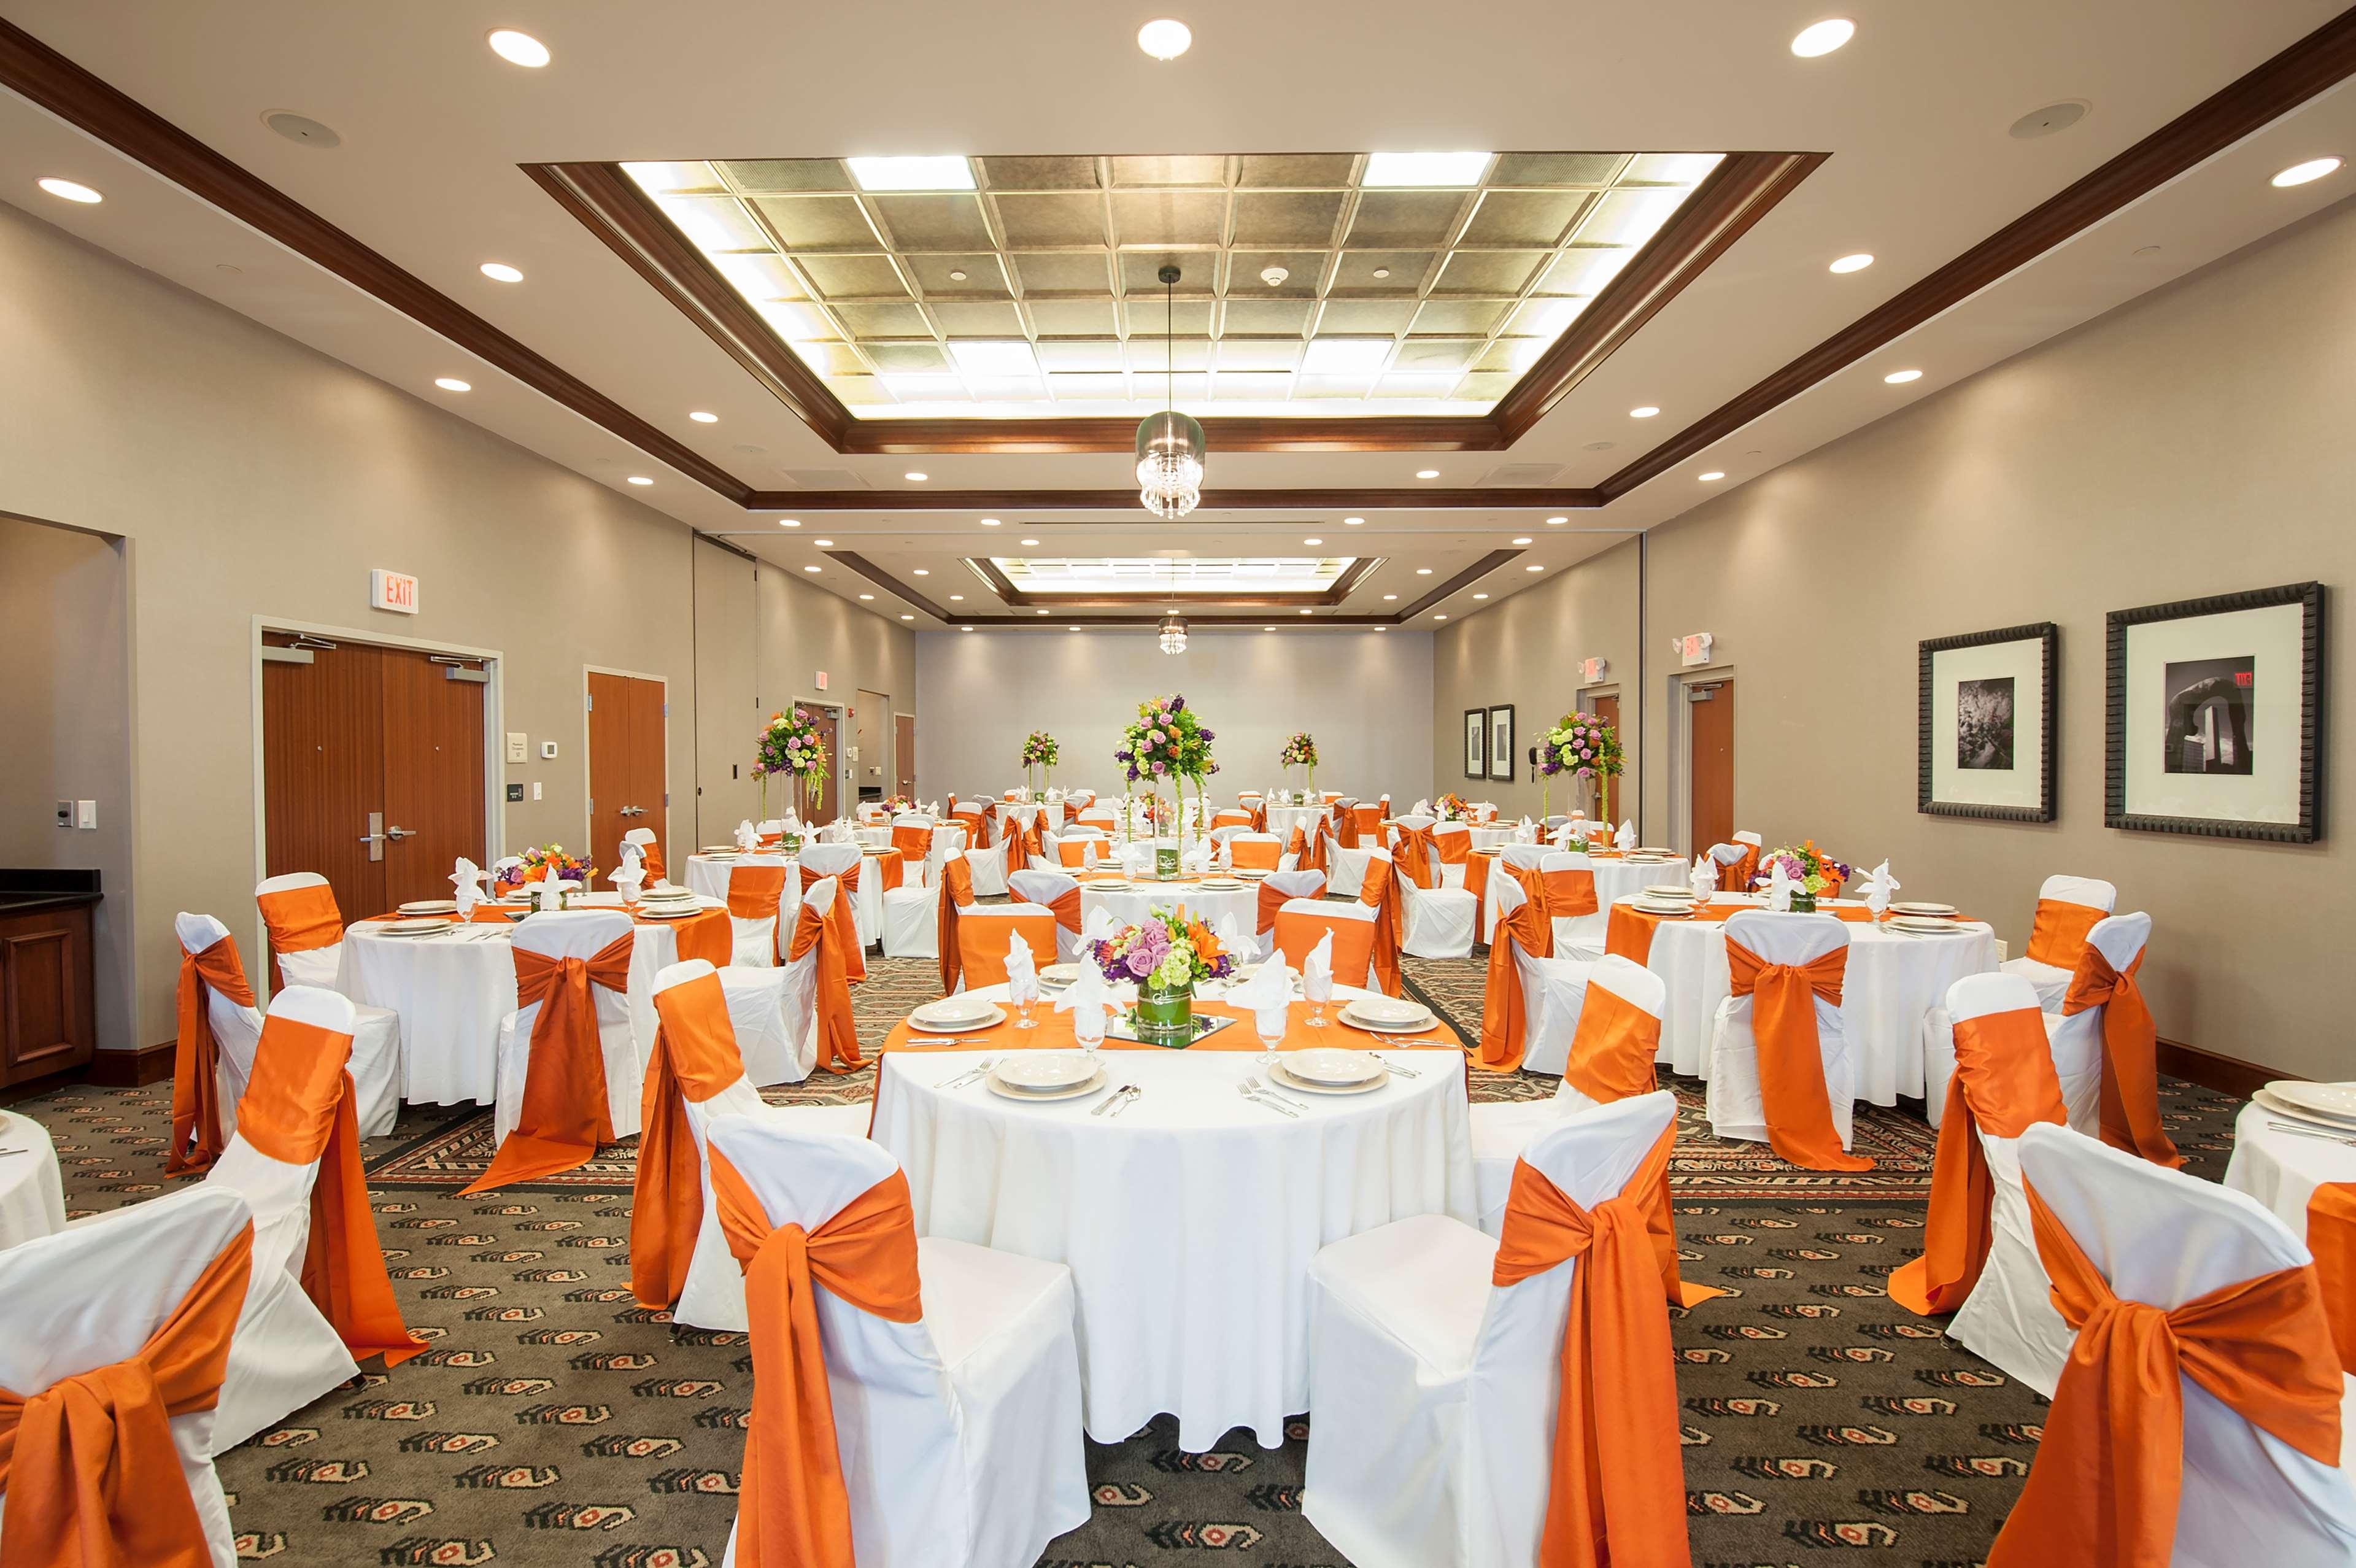 Hilton Garden Inn Indianapolis South/Greenwood image 29